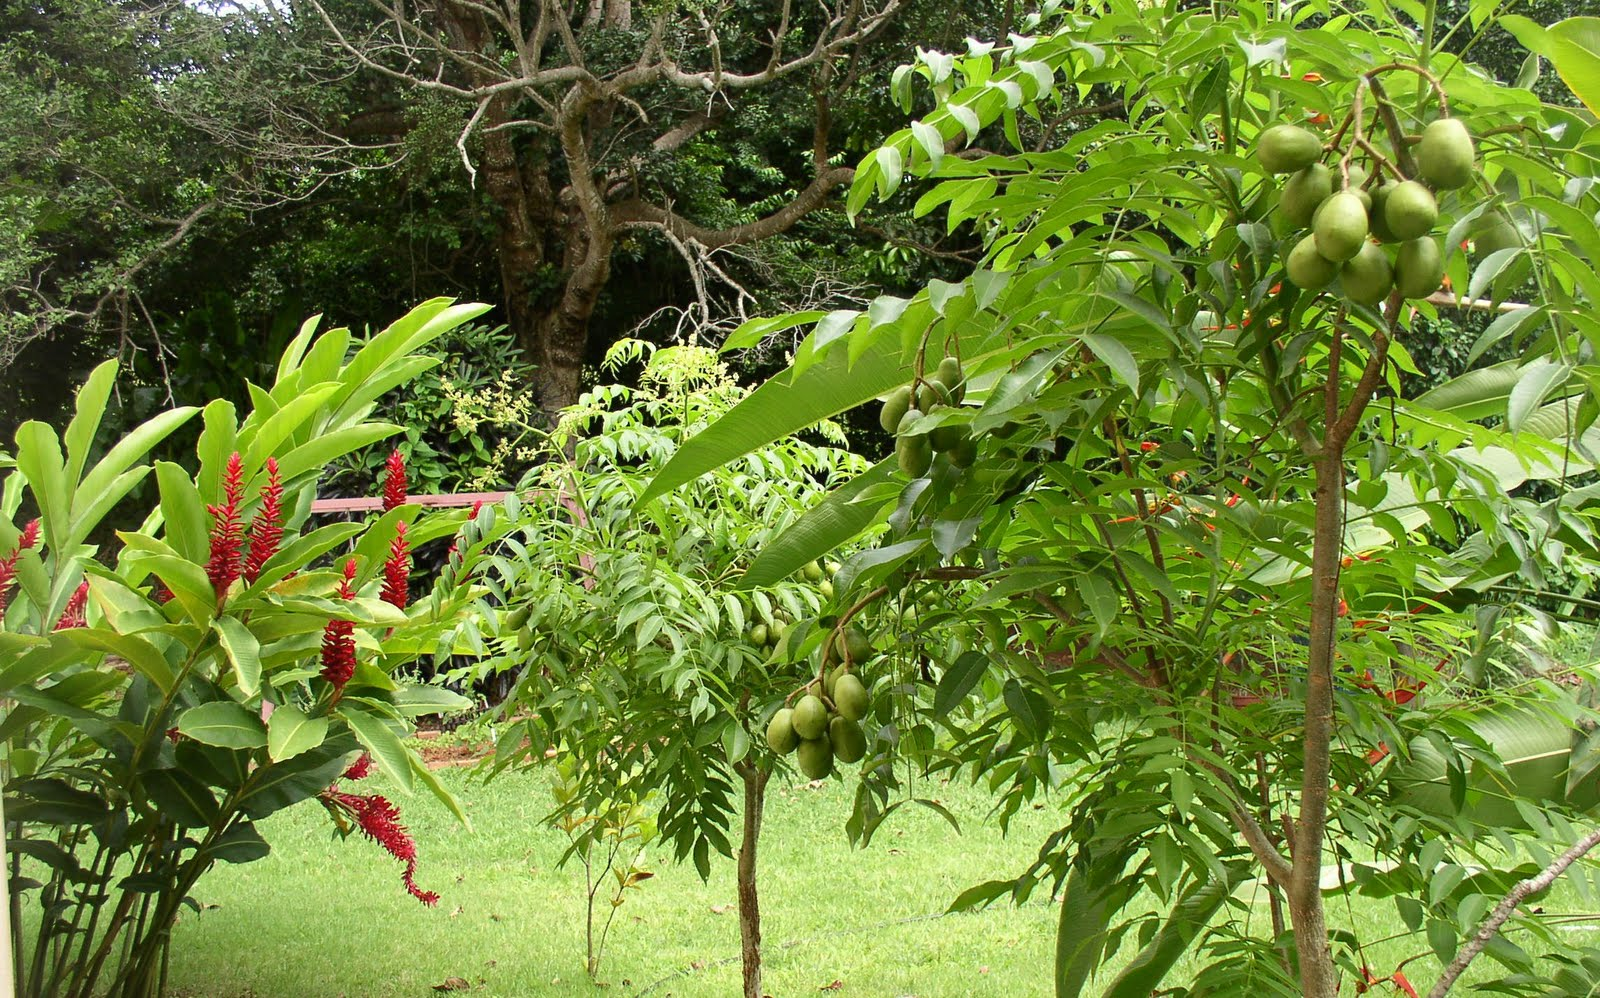 Rboles frutales en tu jard n agrochic gardening content for Arboles frutales para jardin